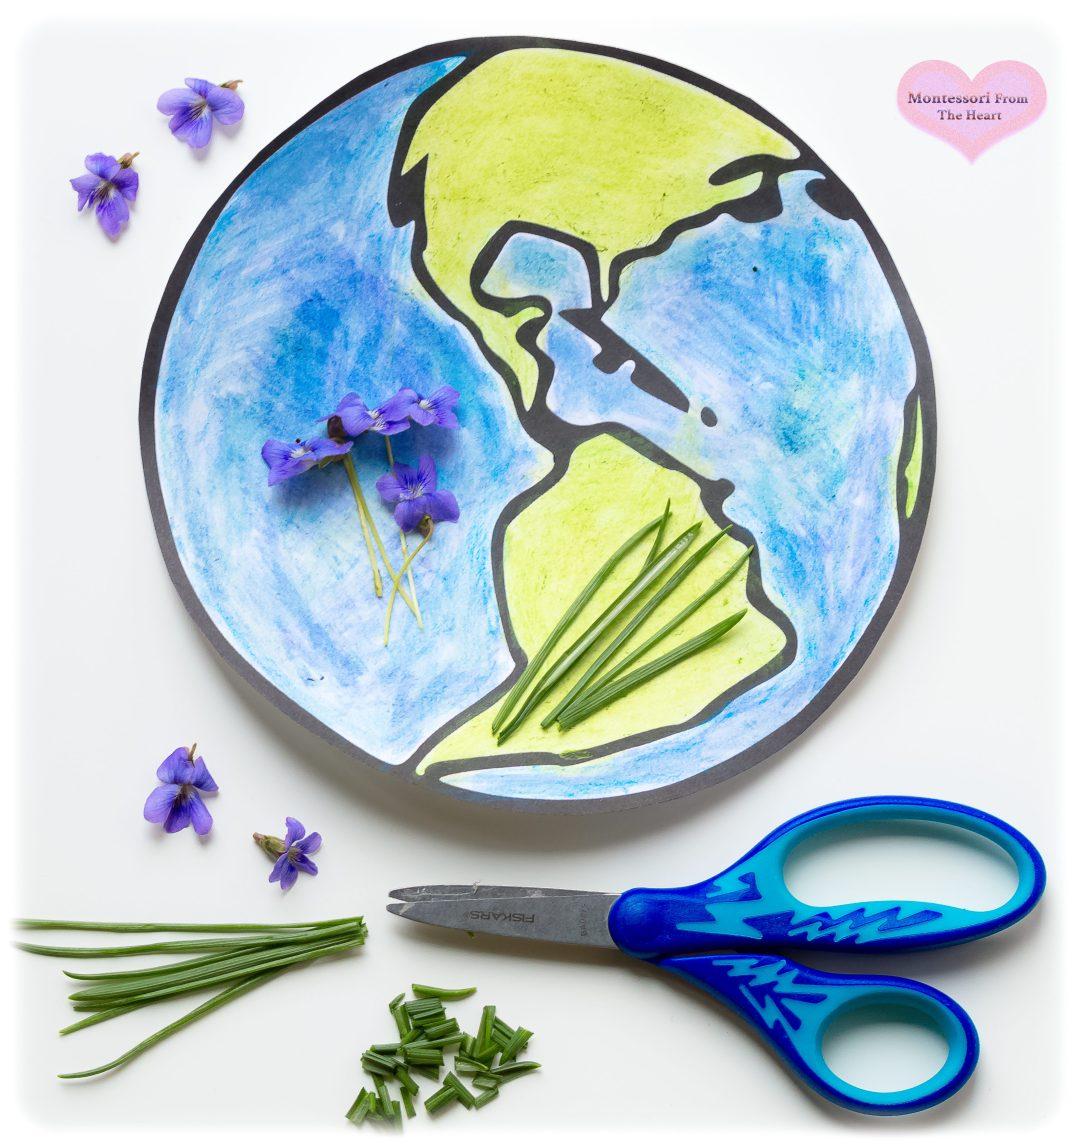 Earth-Day-Nature-Flower-Grass-Rub-Kids-Craft